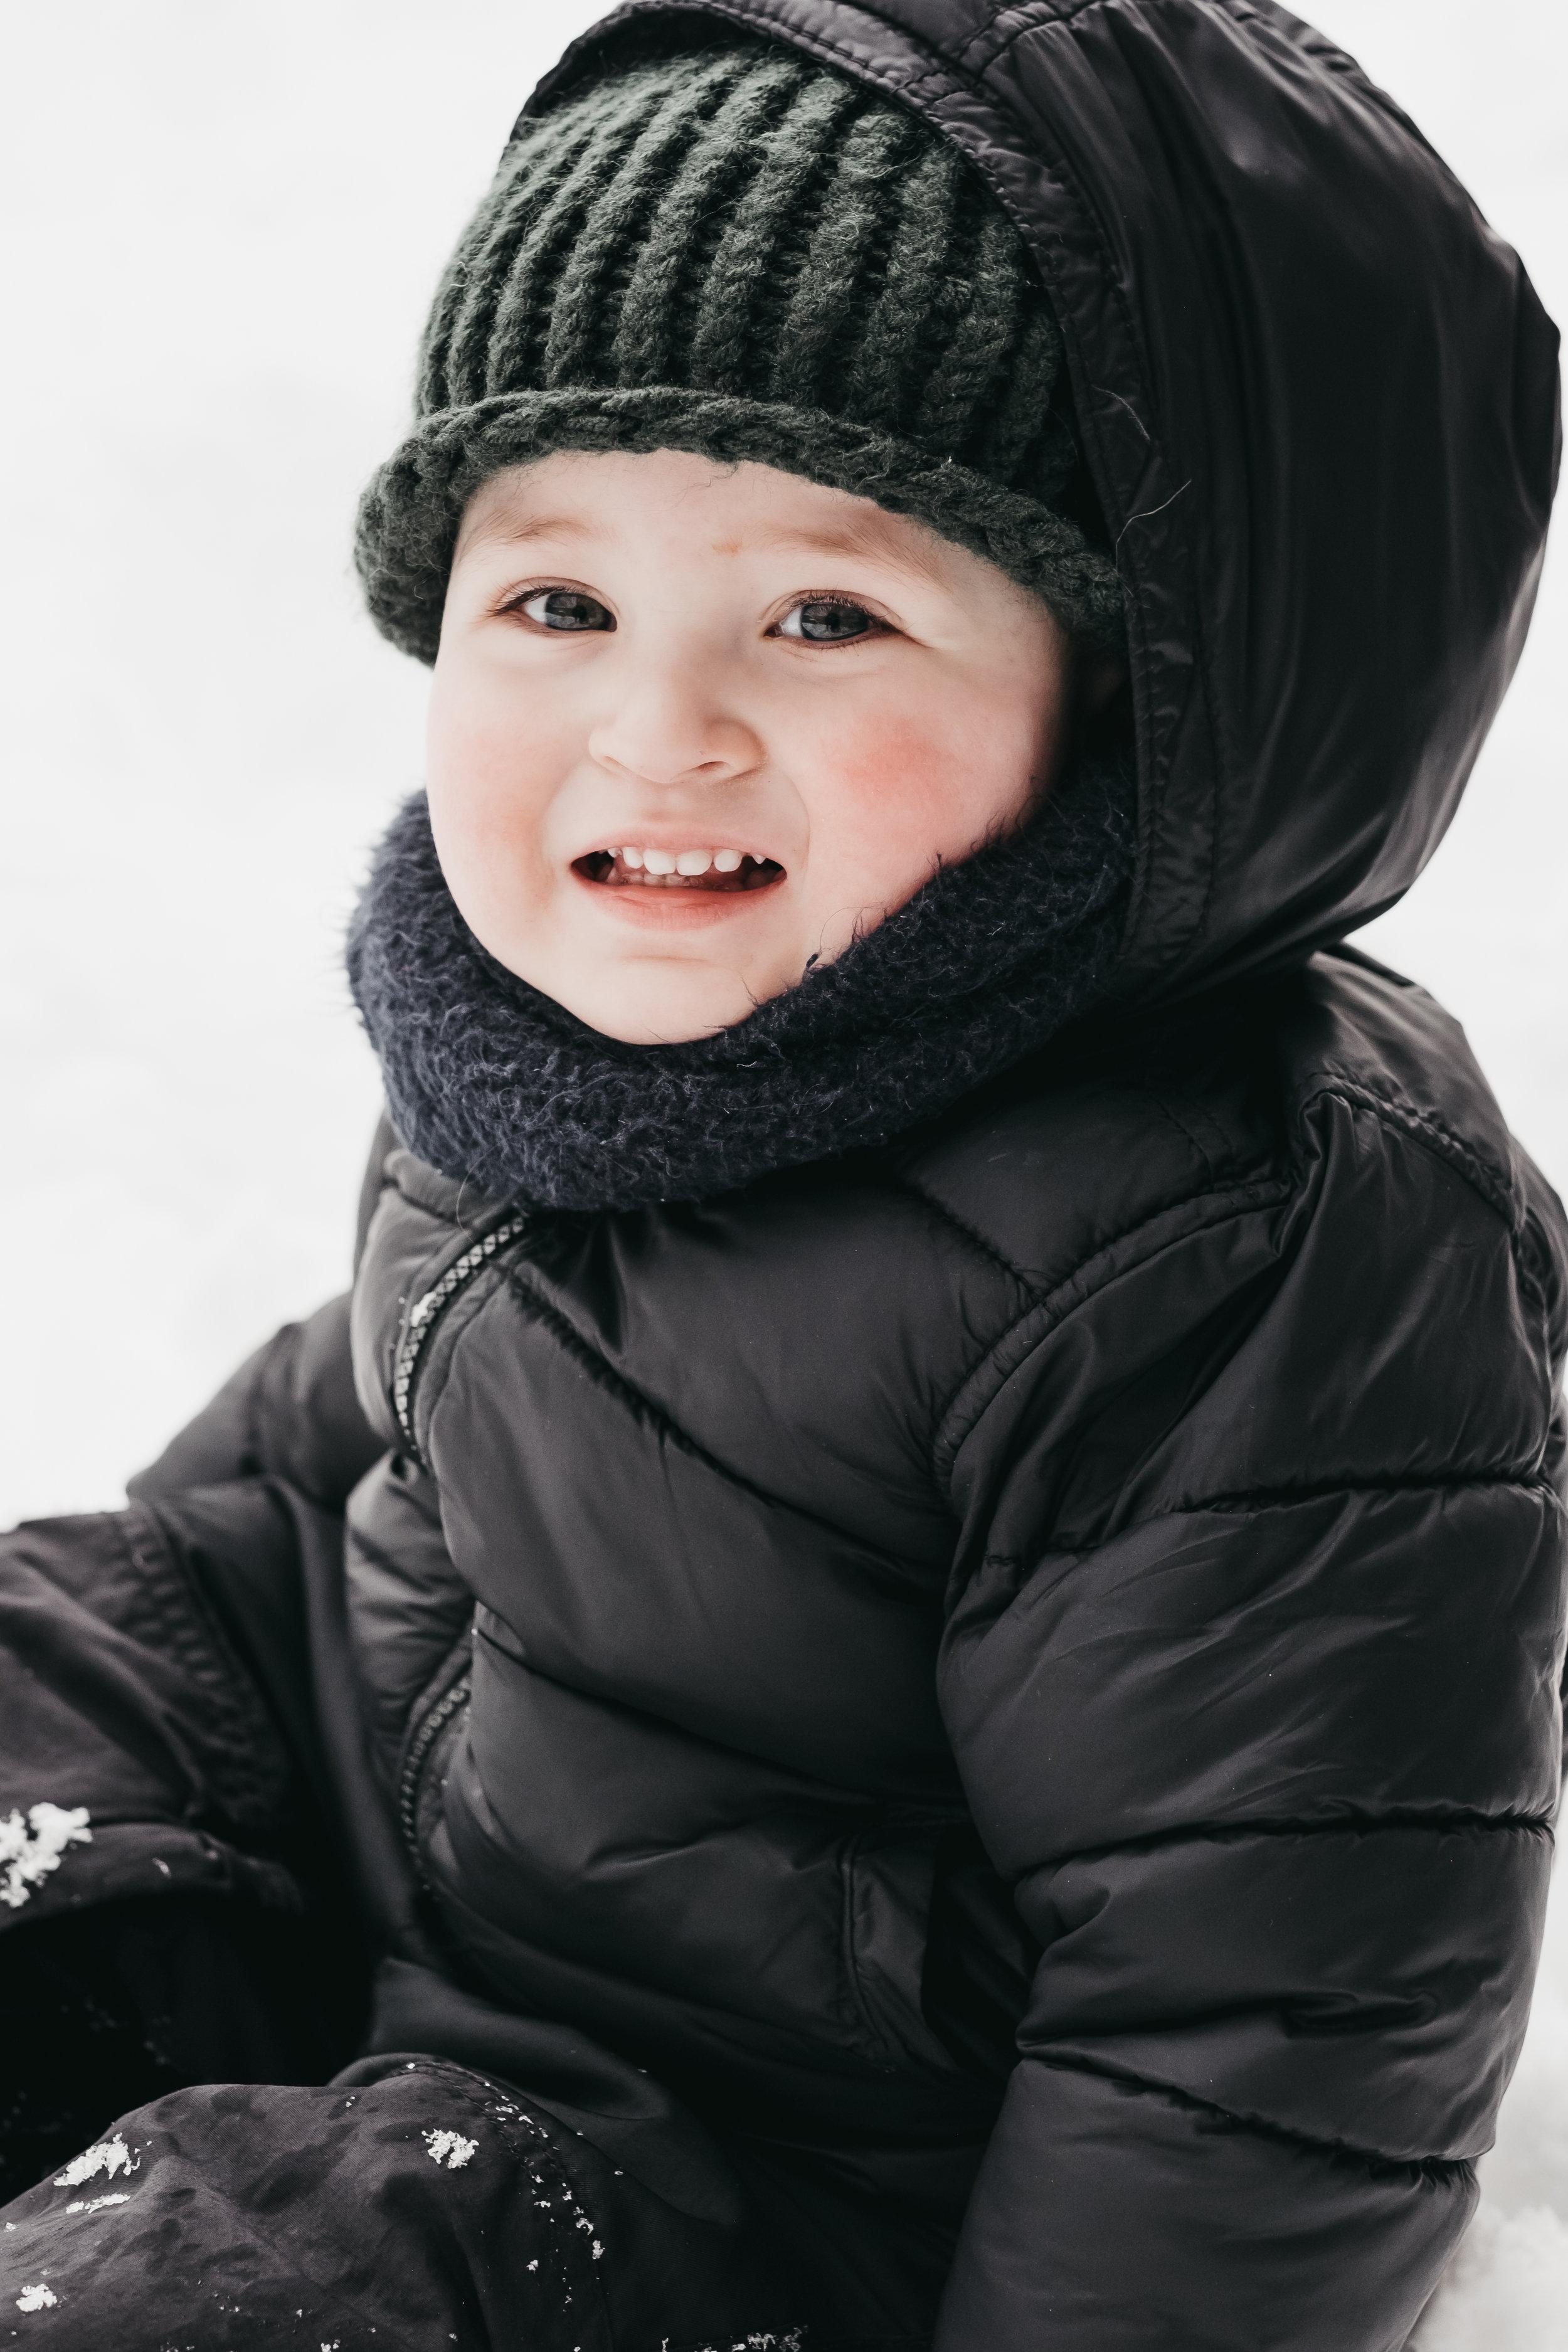 Snow Day 02-09-10.jpg